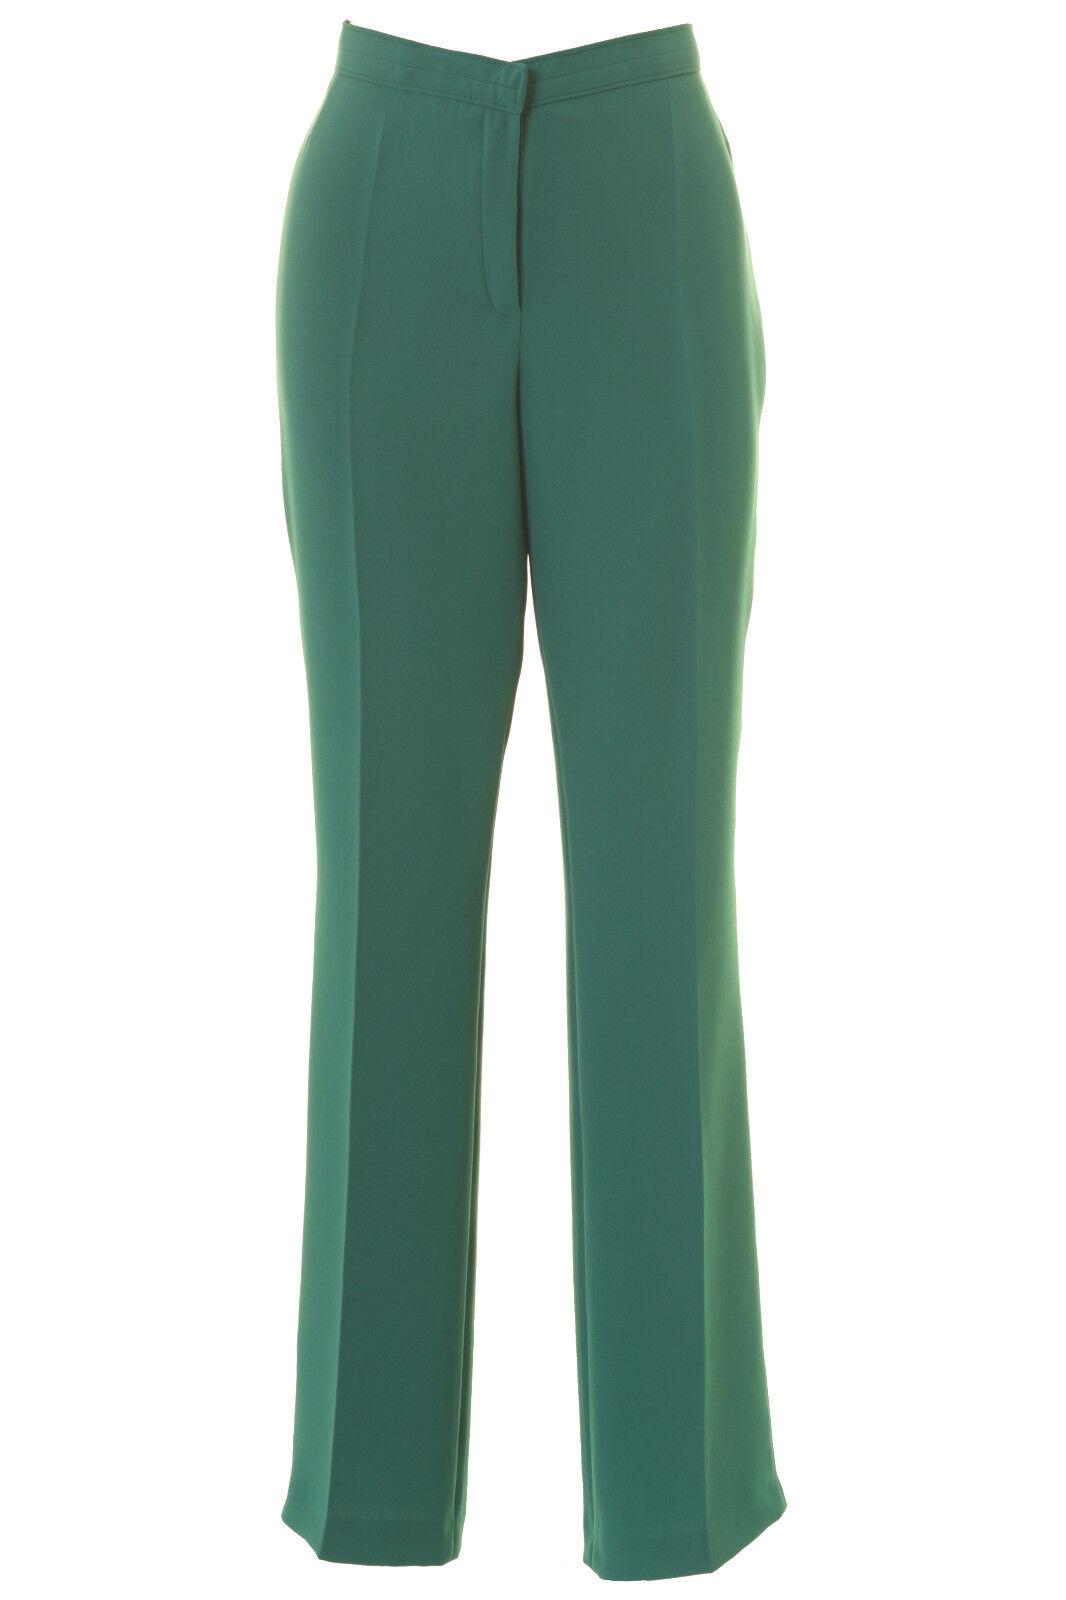 Busy Jade Green Smart Ladies Trousers